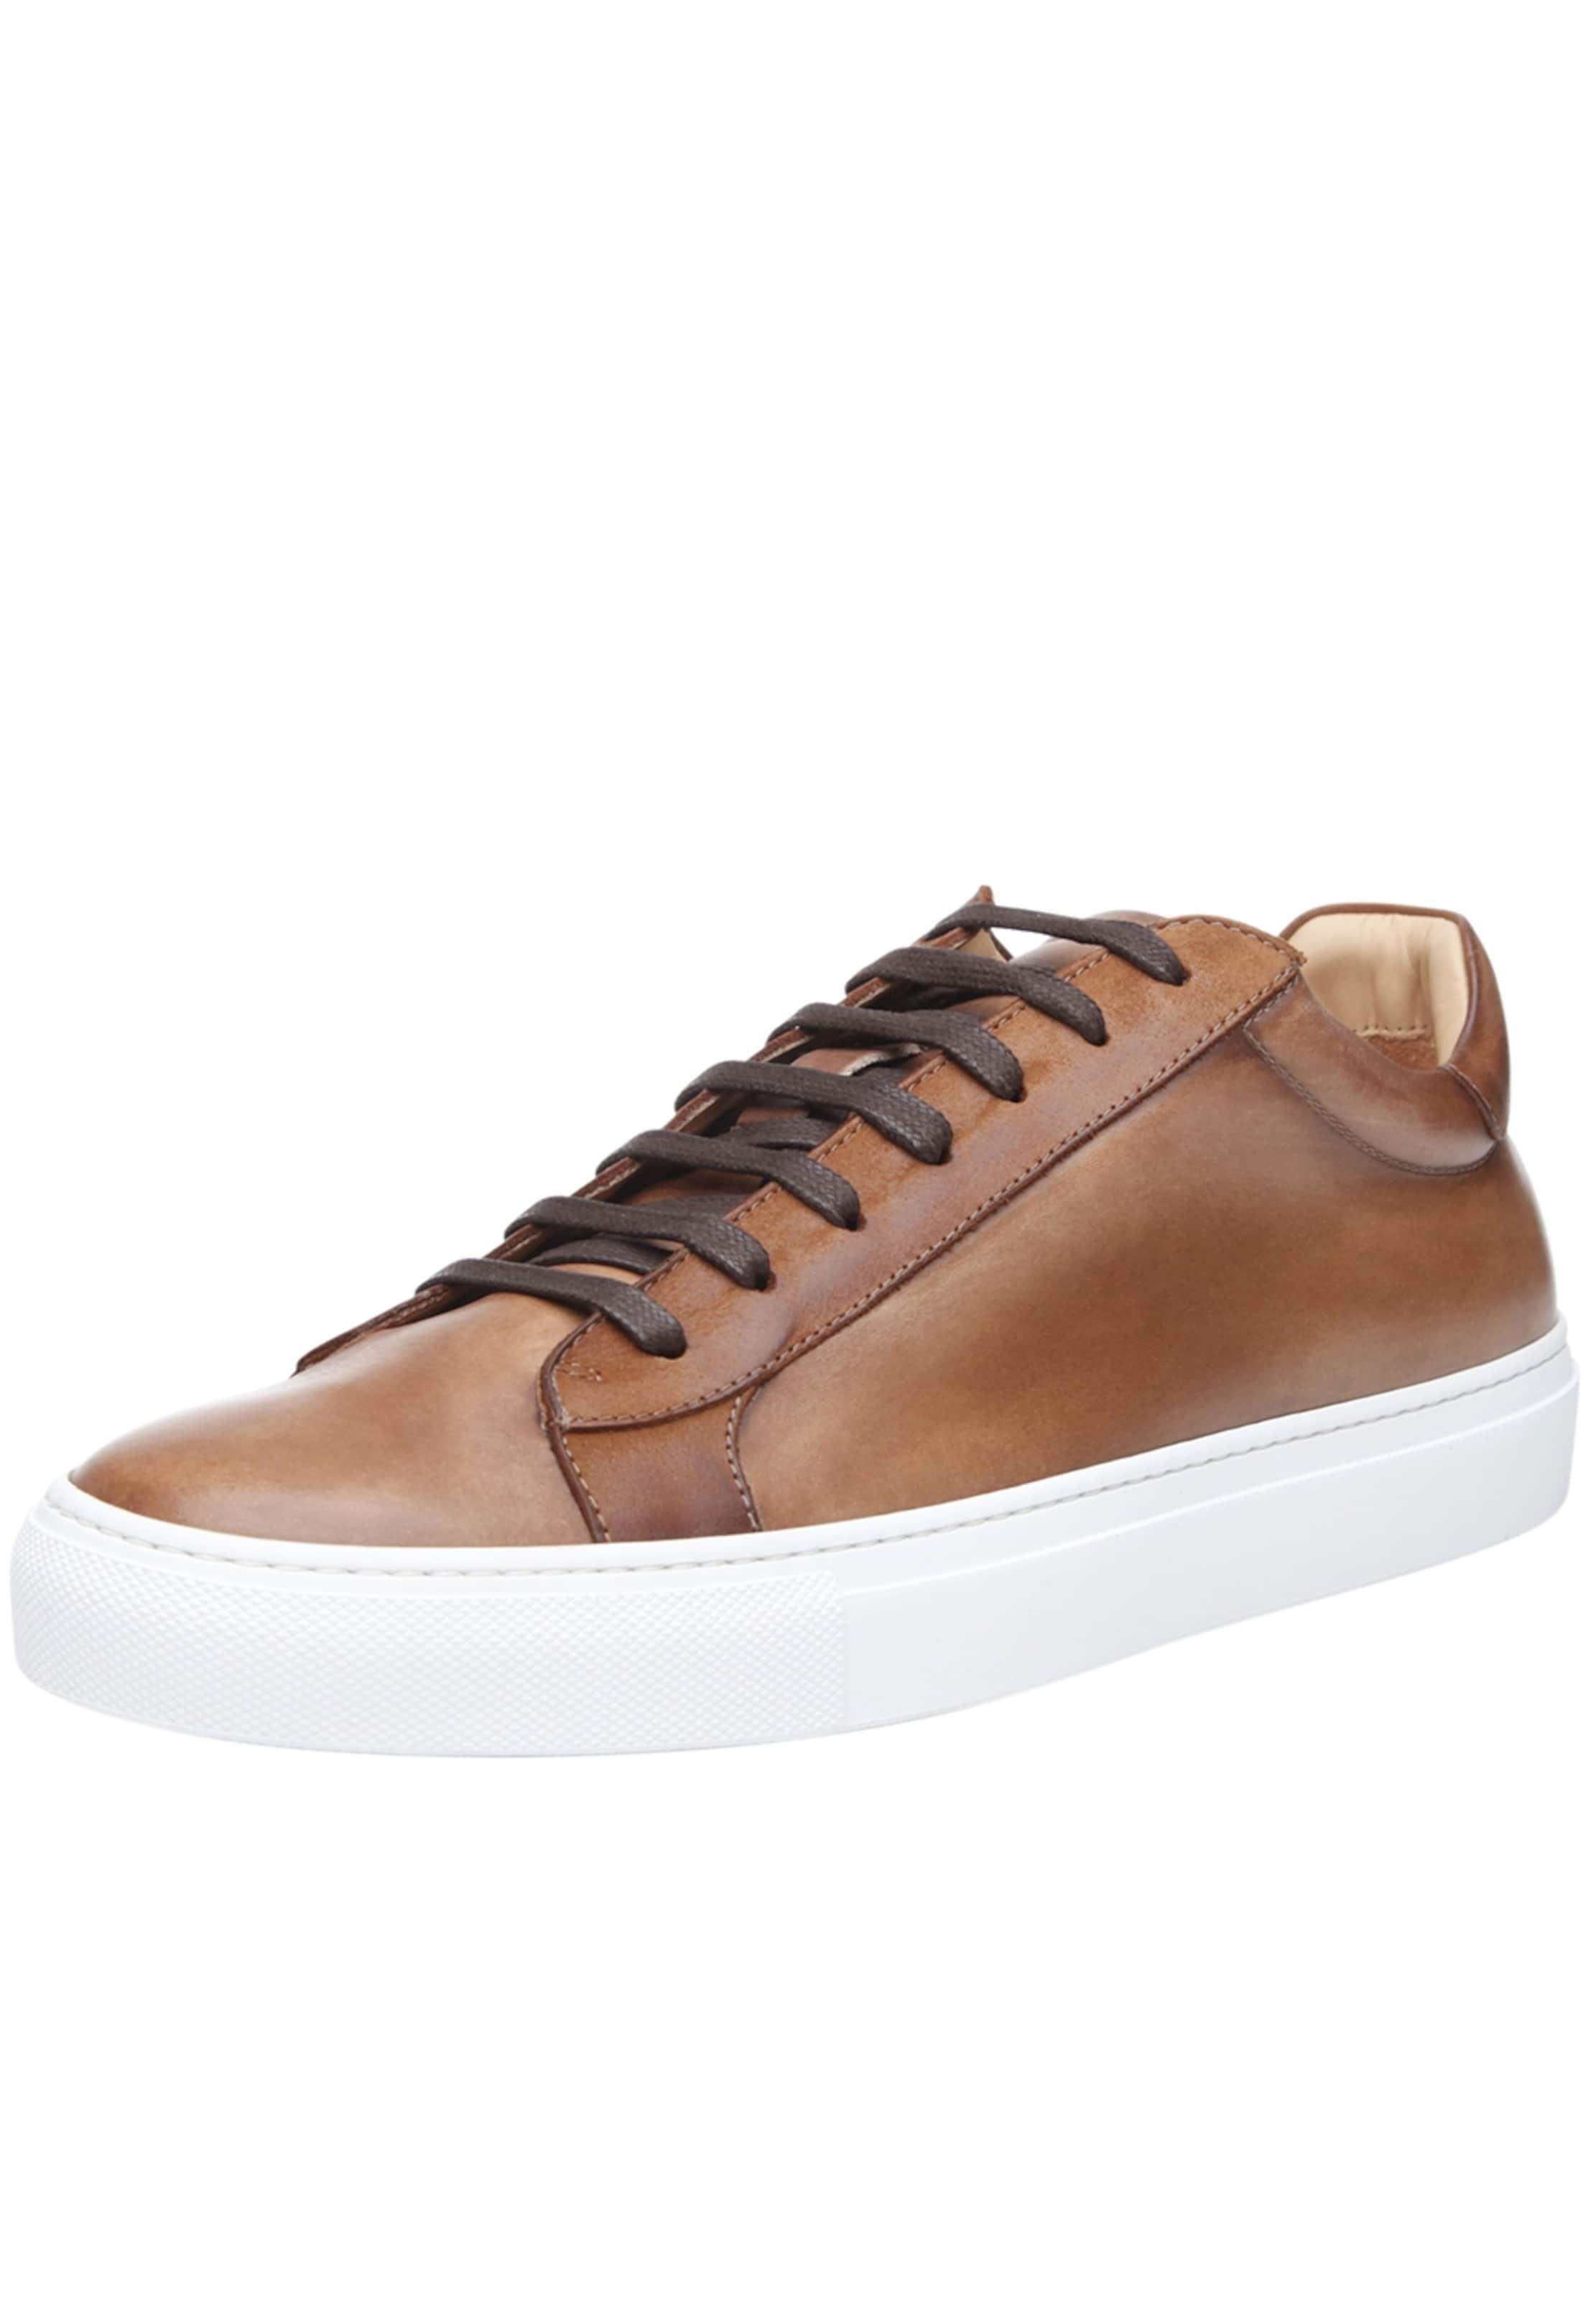 SHOEPASSION Sneaker No. 51 MS Hohe Qualität